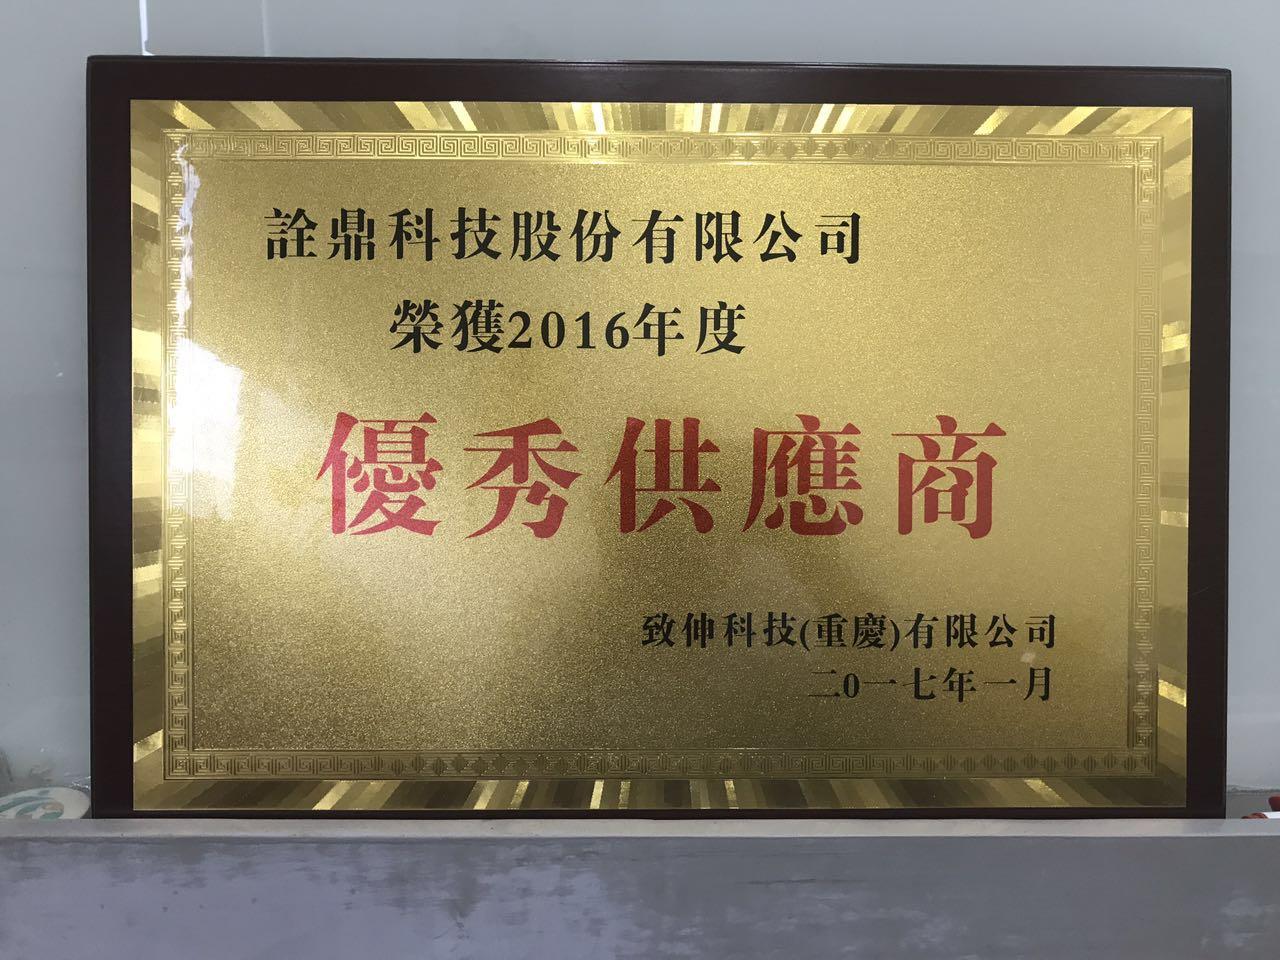 2016 Best Supplier Award